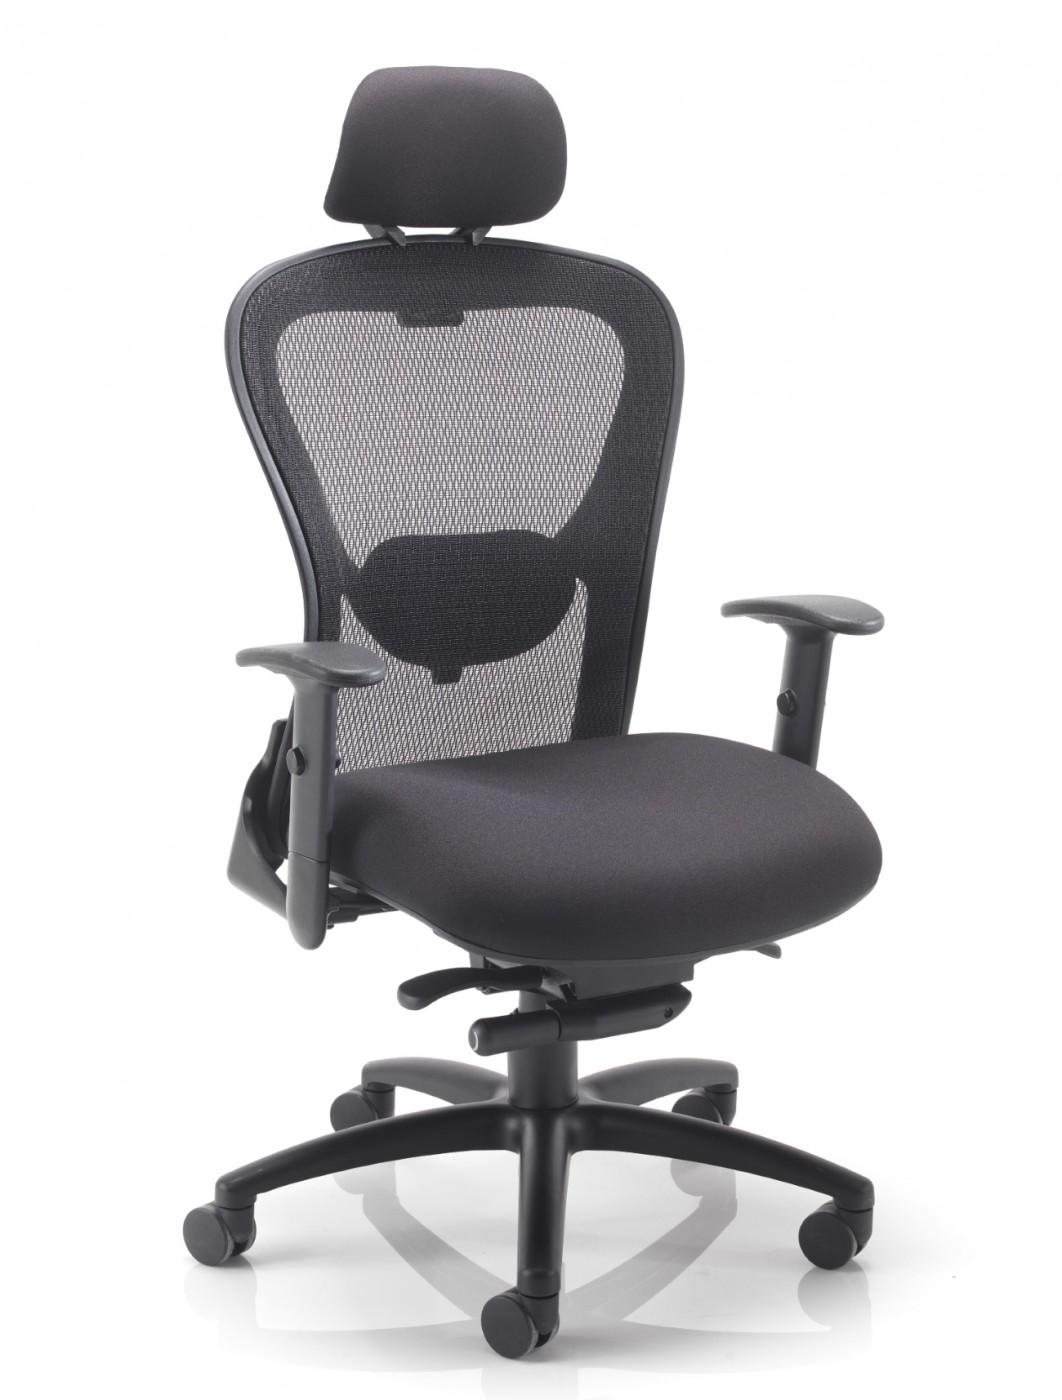 chair mesh stool aerodynamic office chairs tc strata 24 hour